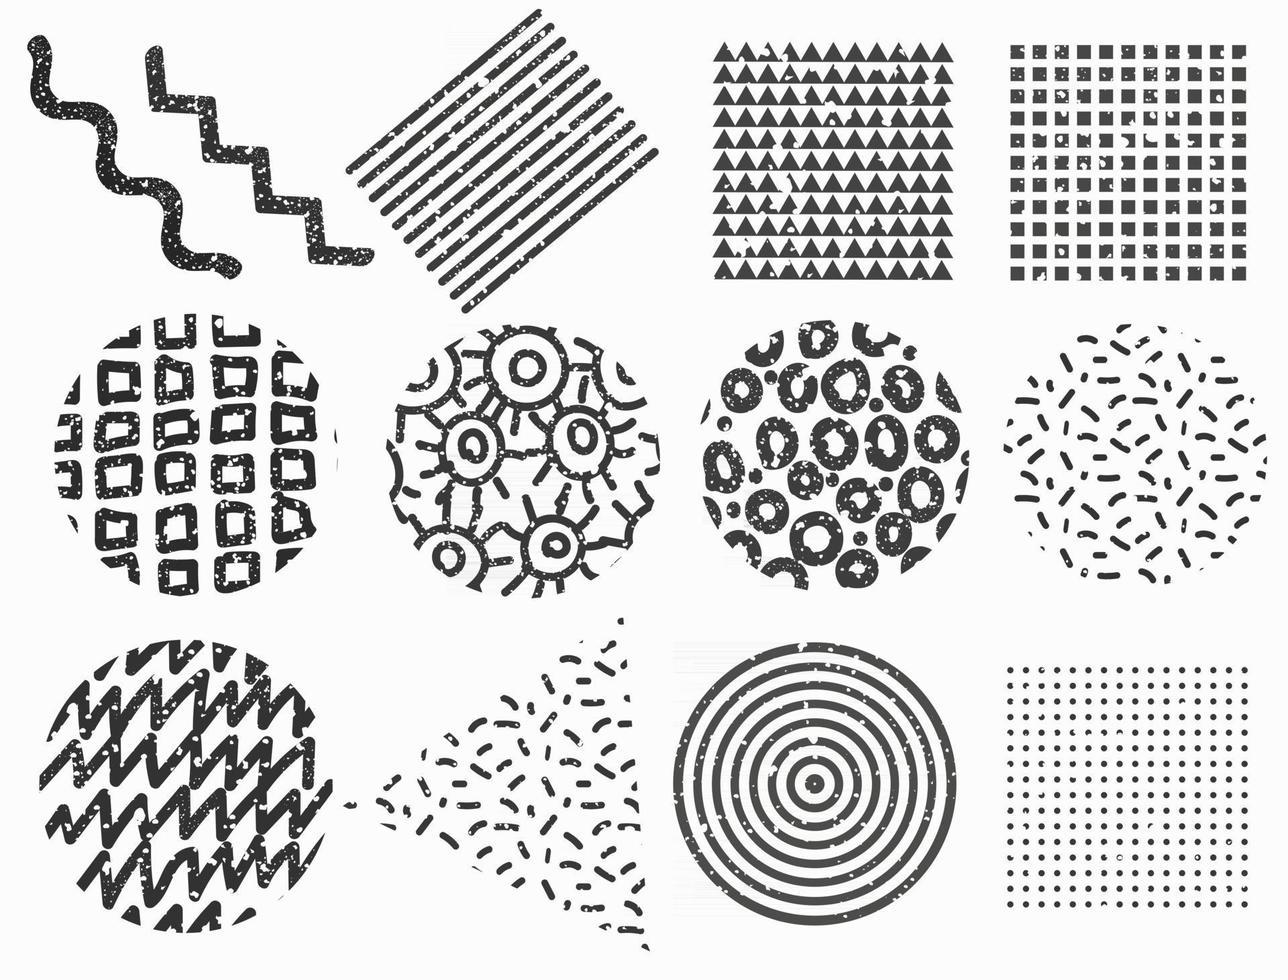 conjunto de formas geométricas de memphis. elementos texturizados do vetor para web design.